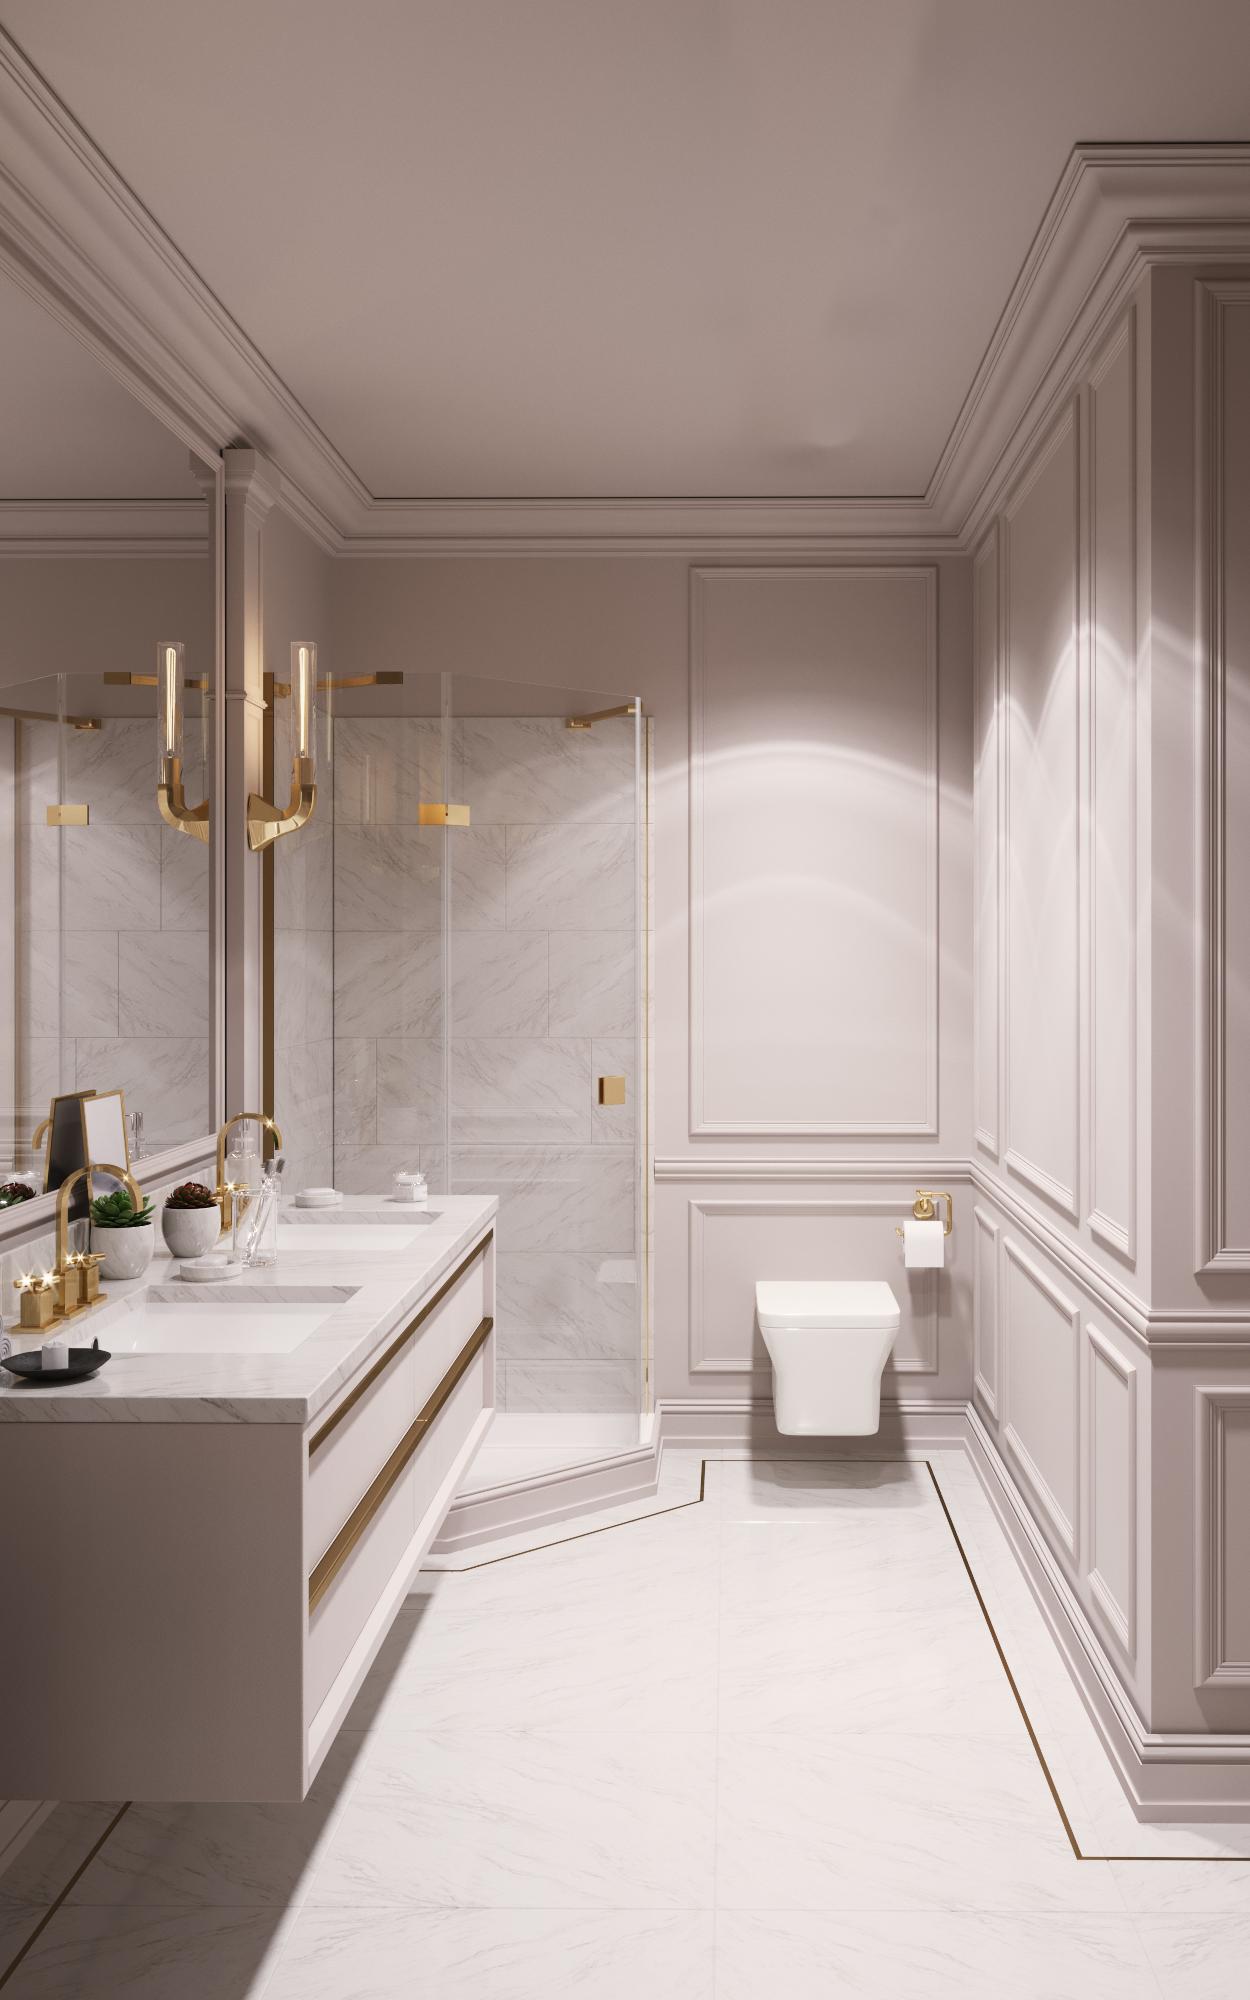 33+ Amazing Bathroom Wall Decor Ideas Will Inspire Your